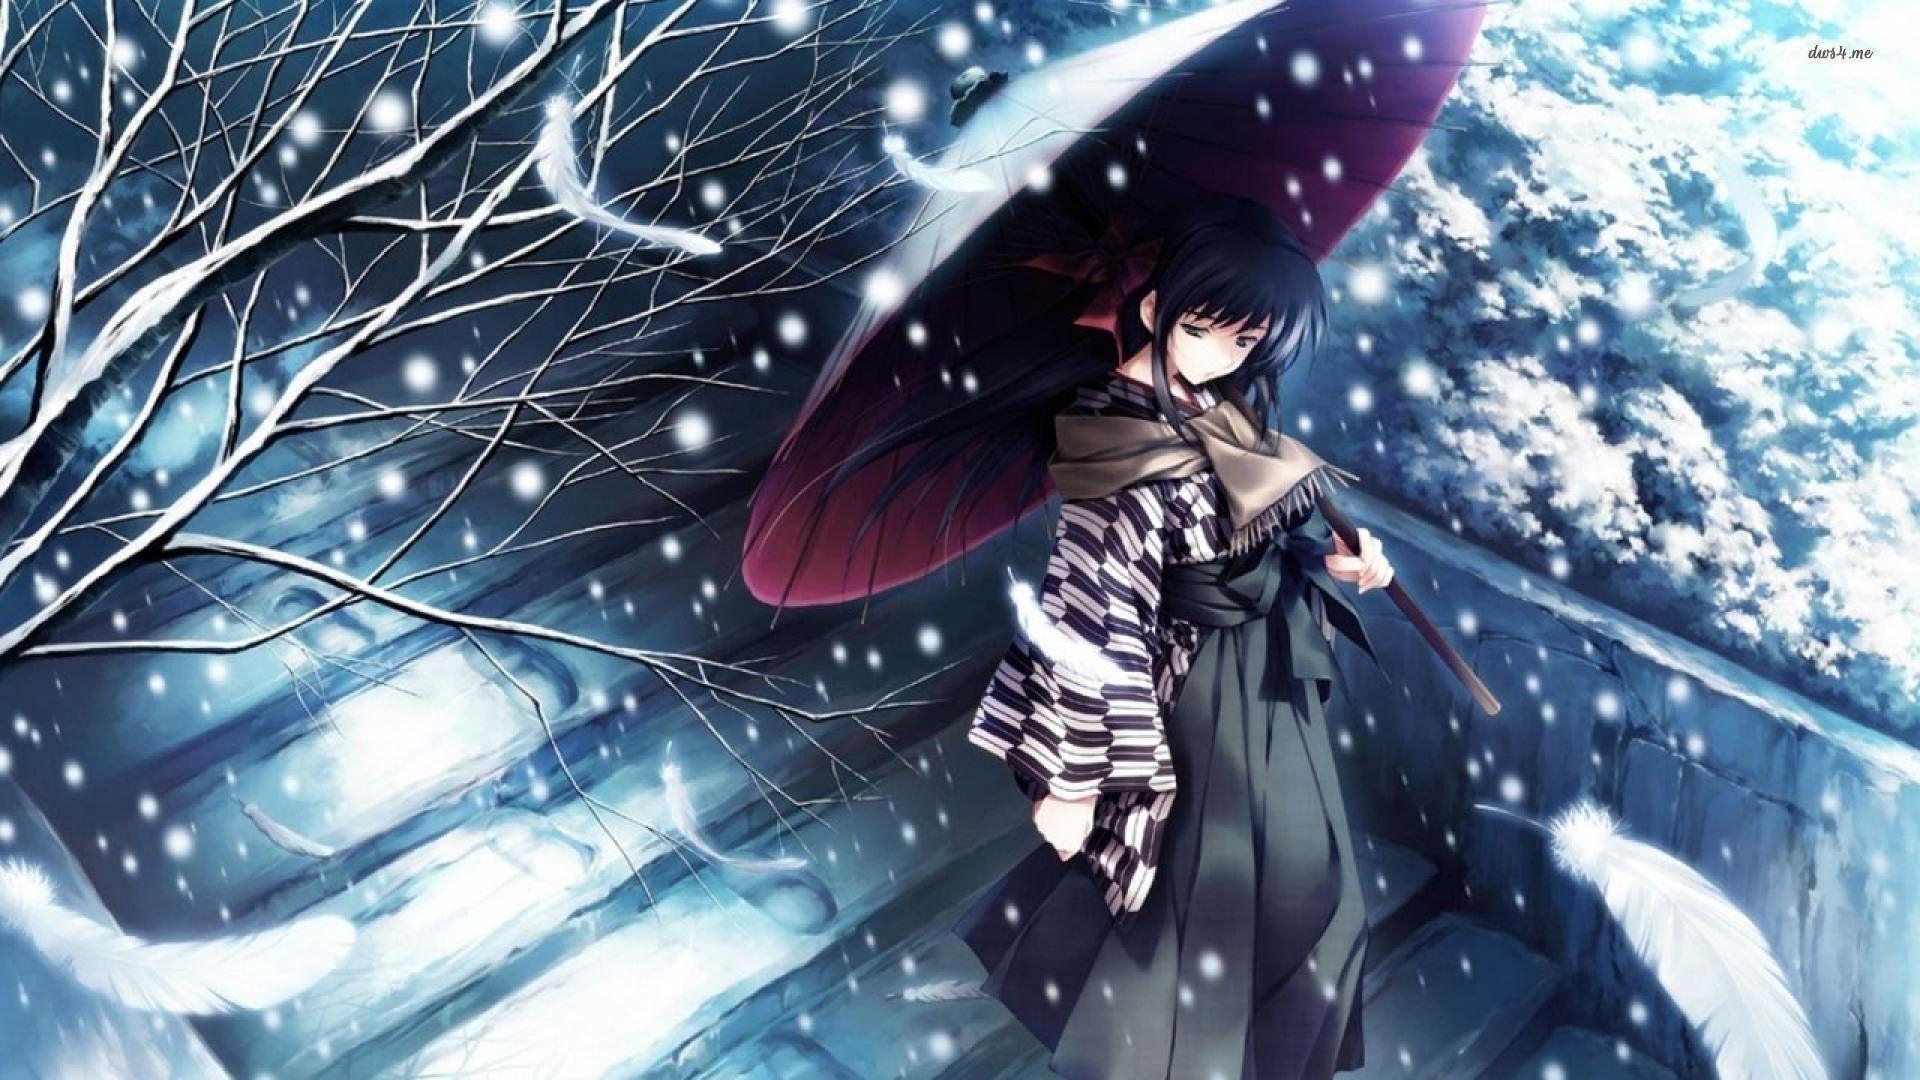 Anime Wallpaper For Facebook Cover Alone Anime Wallpapers Top Free Alone Anime Backgrounds Anime Faceb Wallpaper Anime Latar Belakang Anime Pemandangan Anime